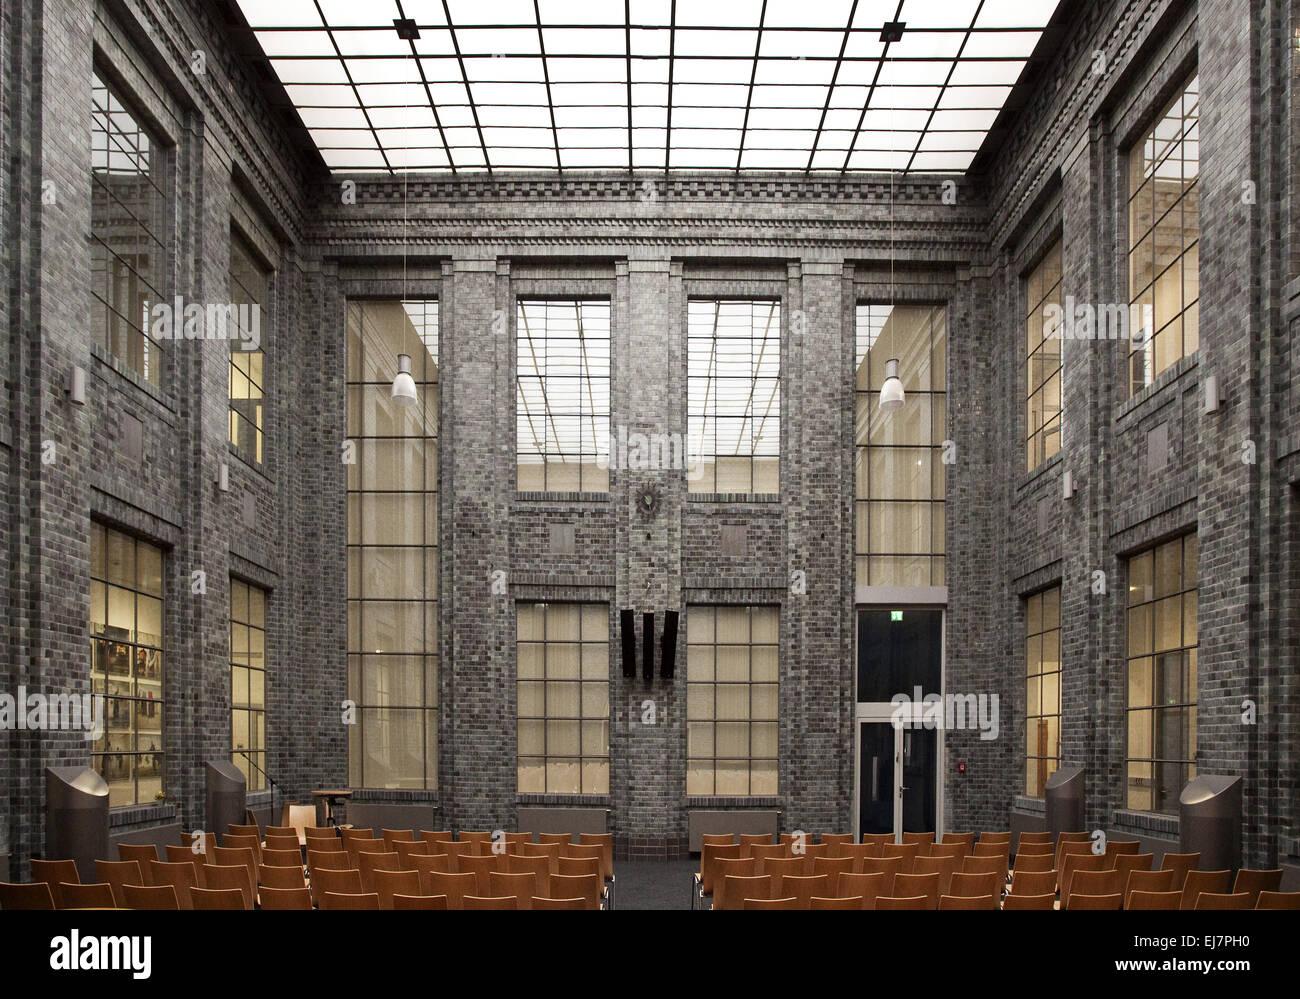 House of Business, Muelheim, Germany - Stock Image